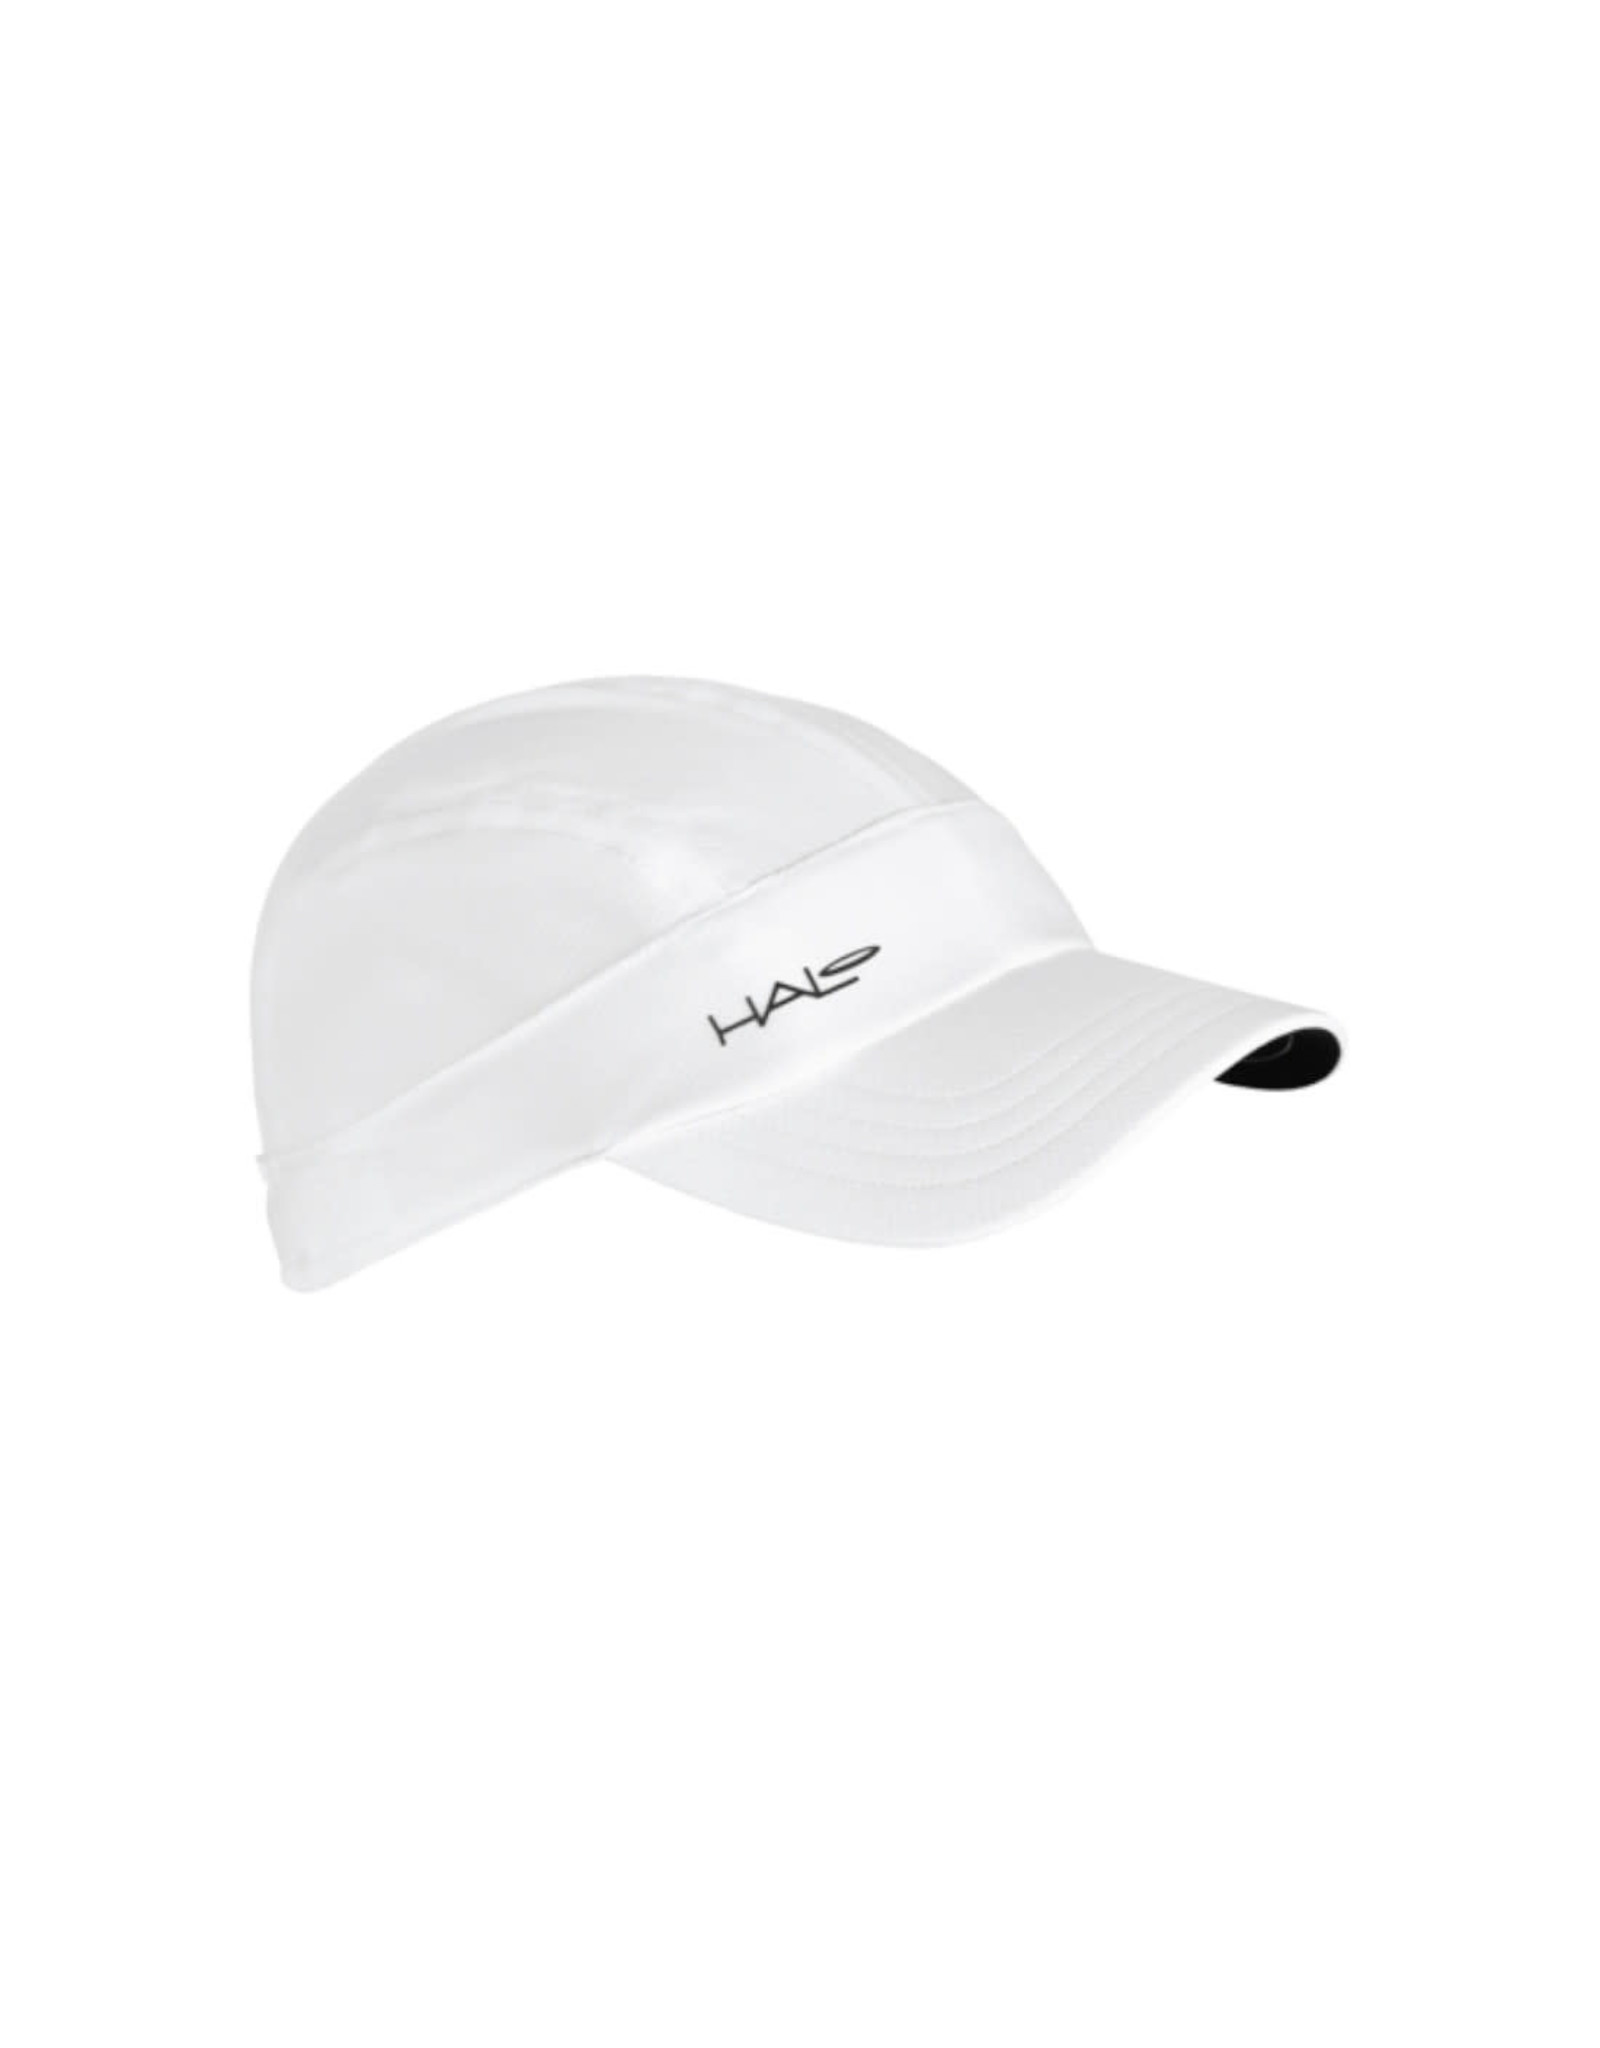 HALO Sport Hat